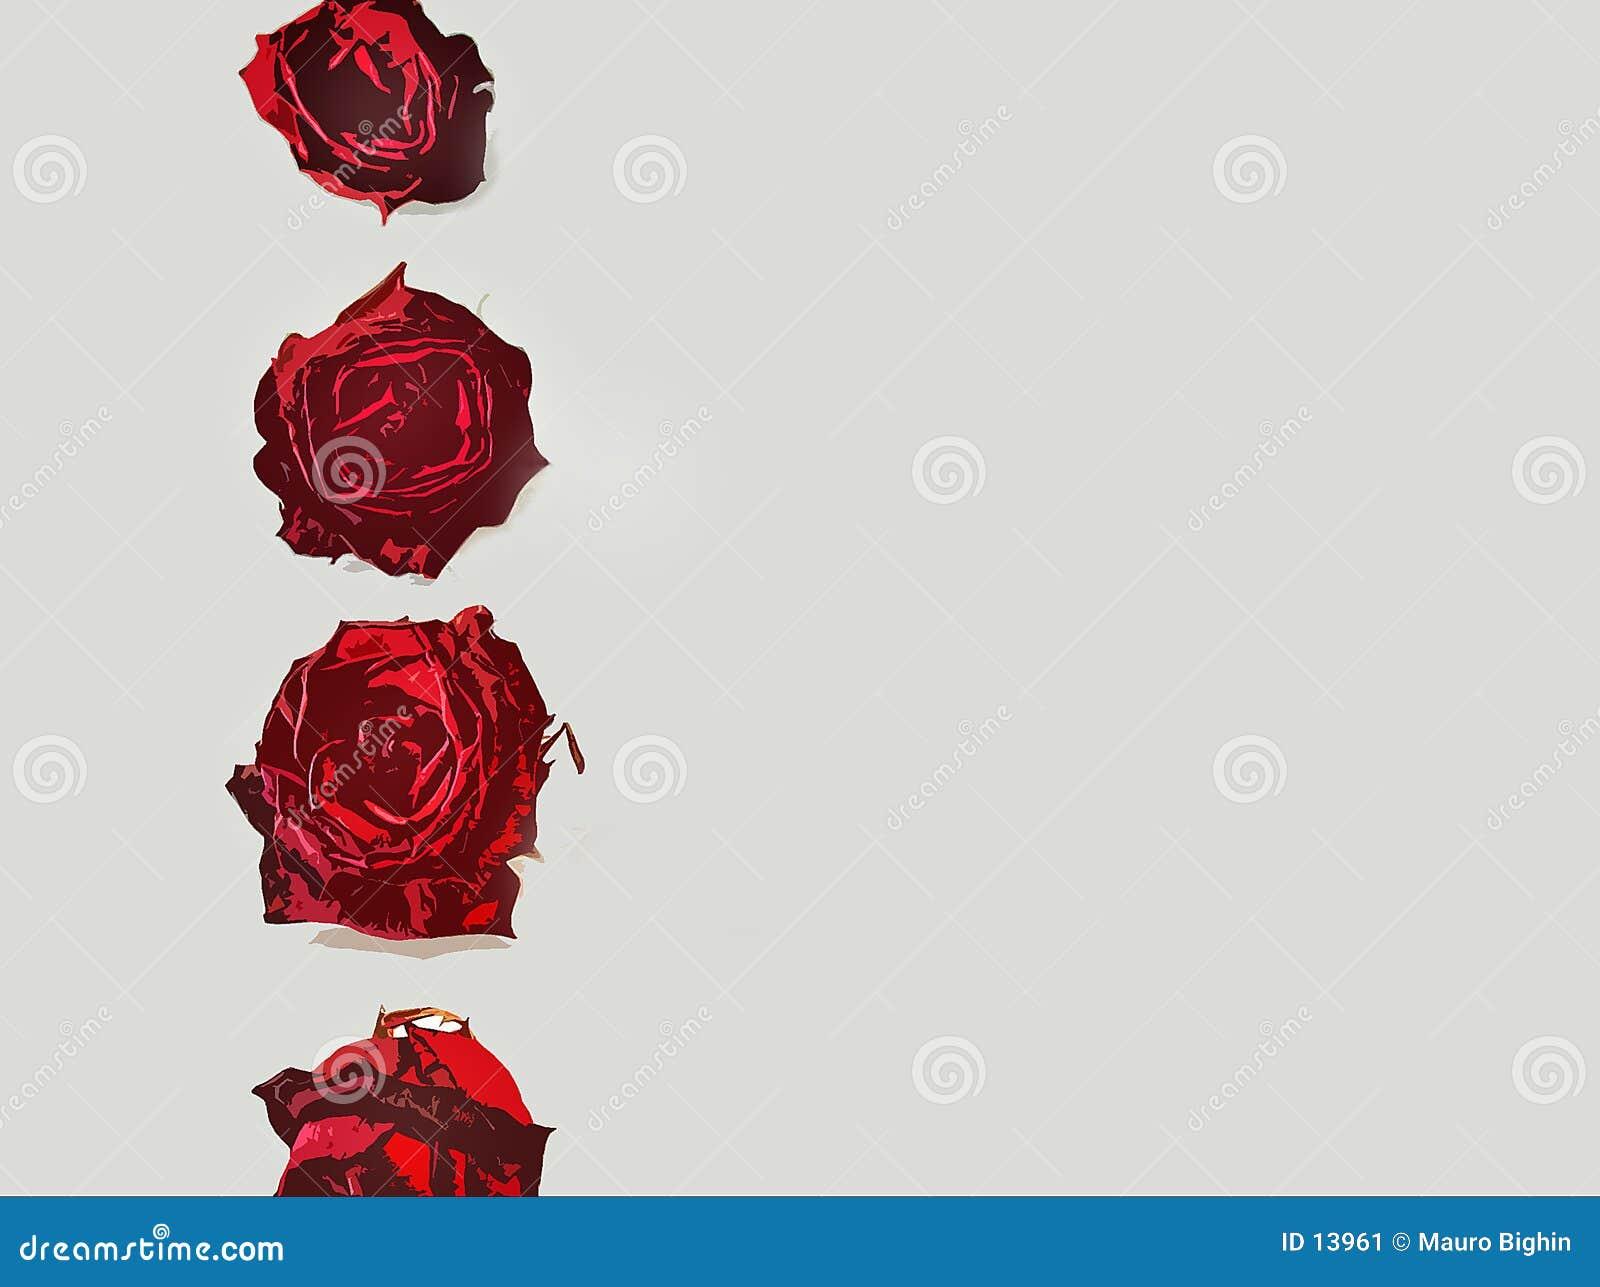 Granica listy rose miłości.